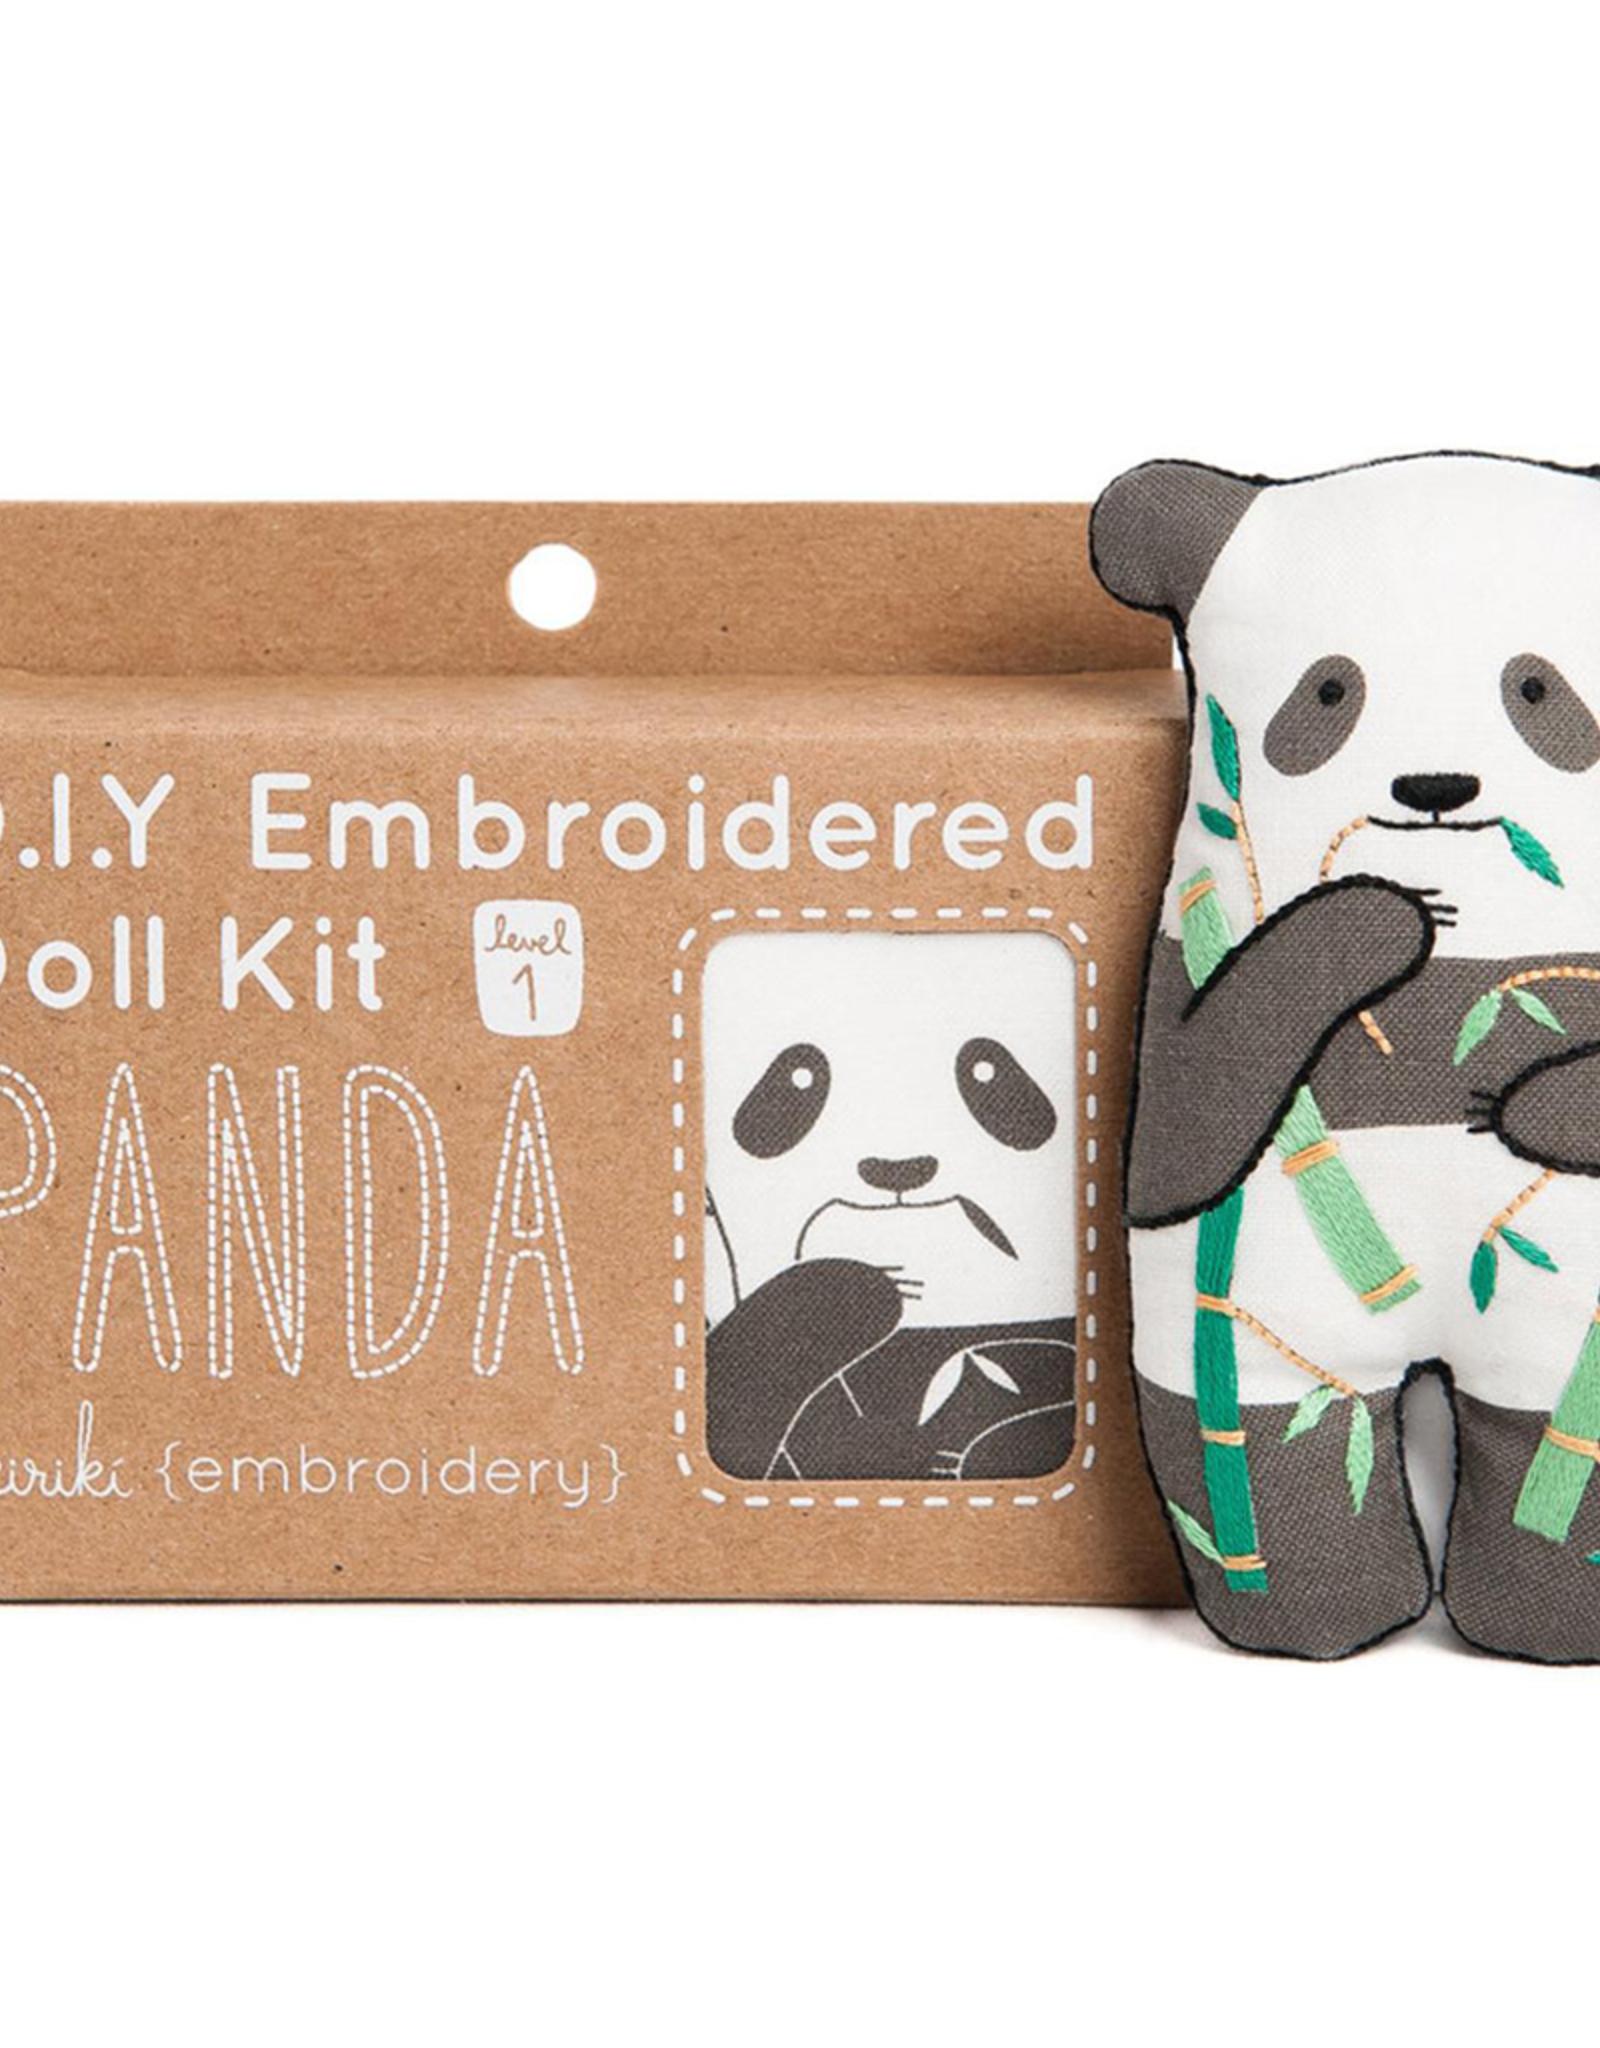 Handmade Embroidery Kit - Panda